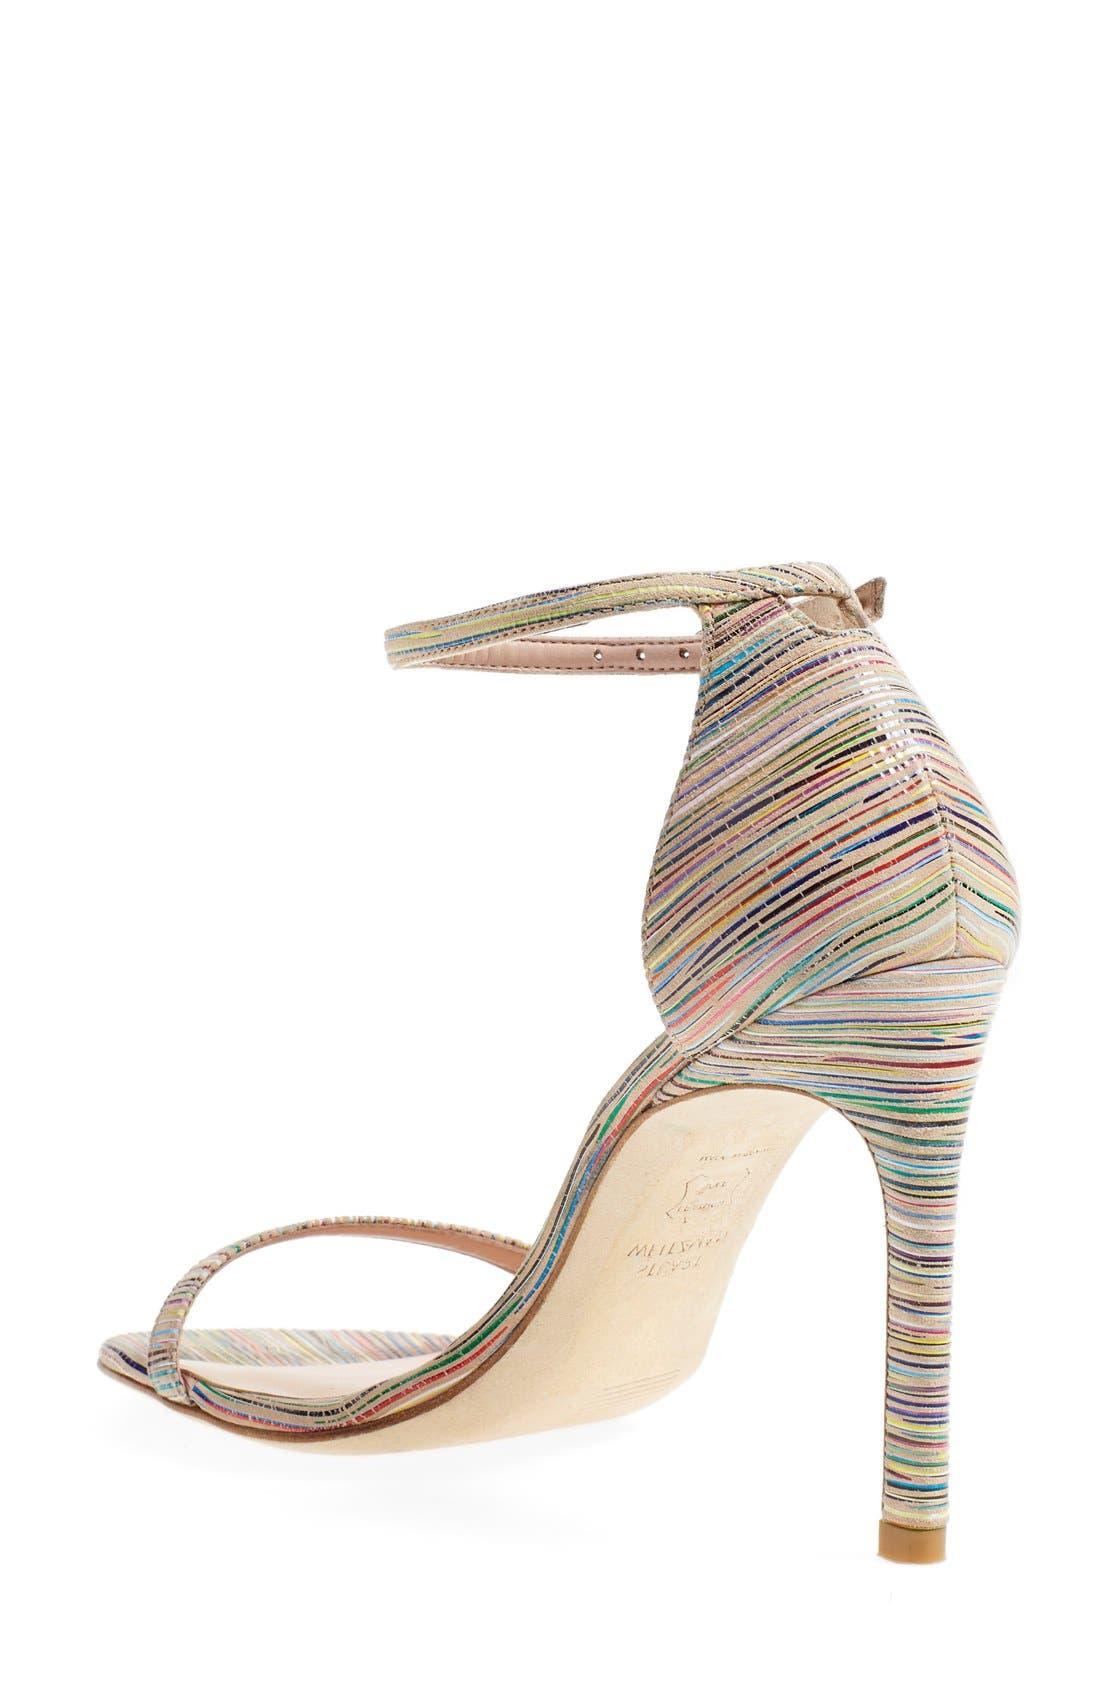 Nudistsong Ankle Strap Sandal,                             Alternate thumbnail 64, color,